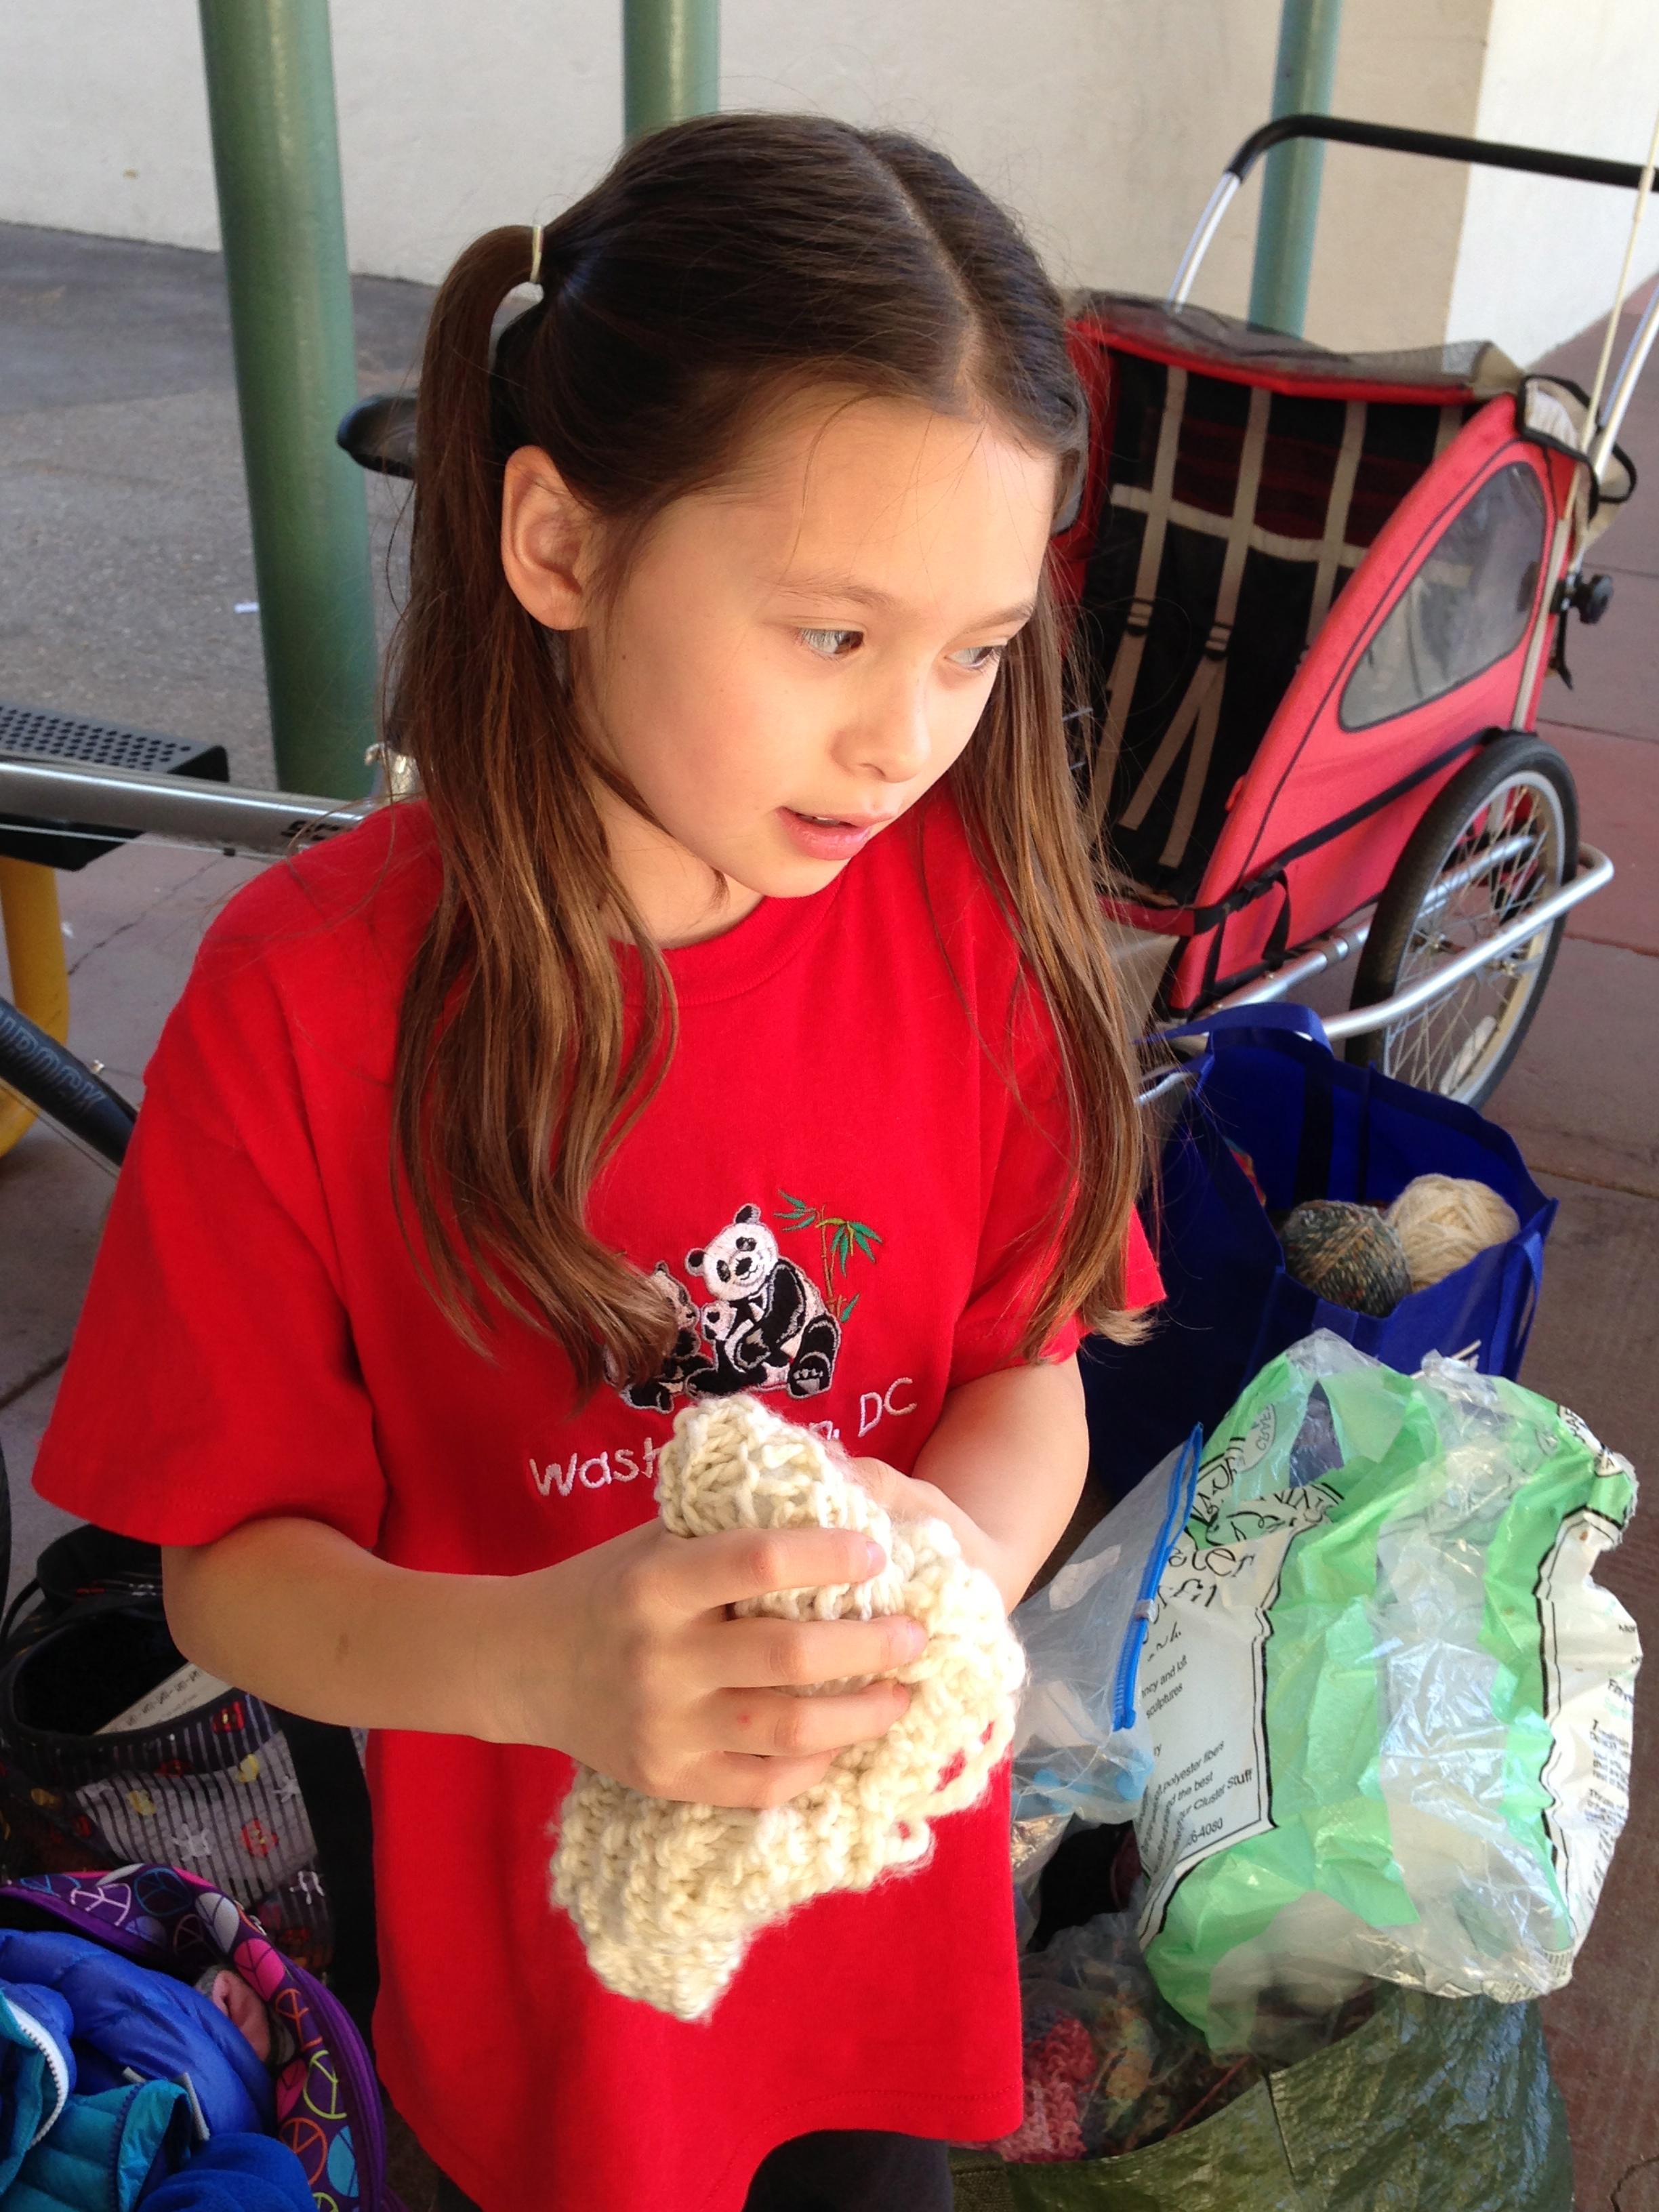 2nd grader stuffing her toy.